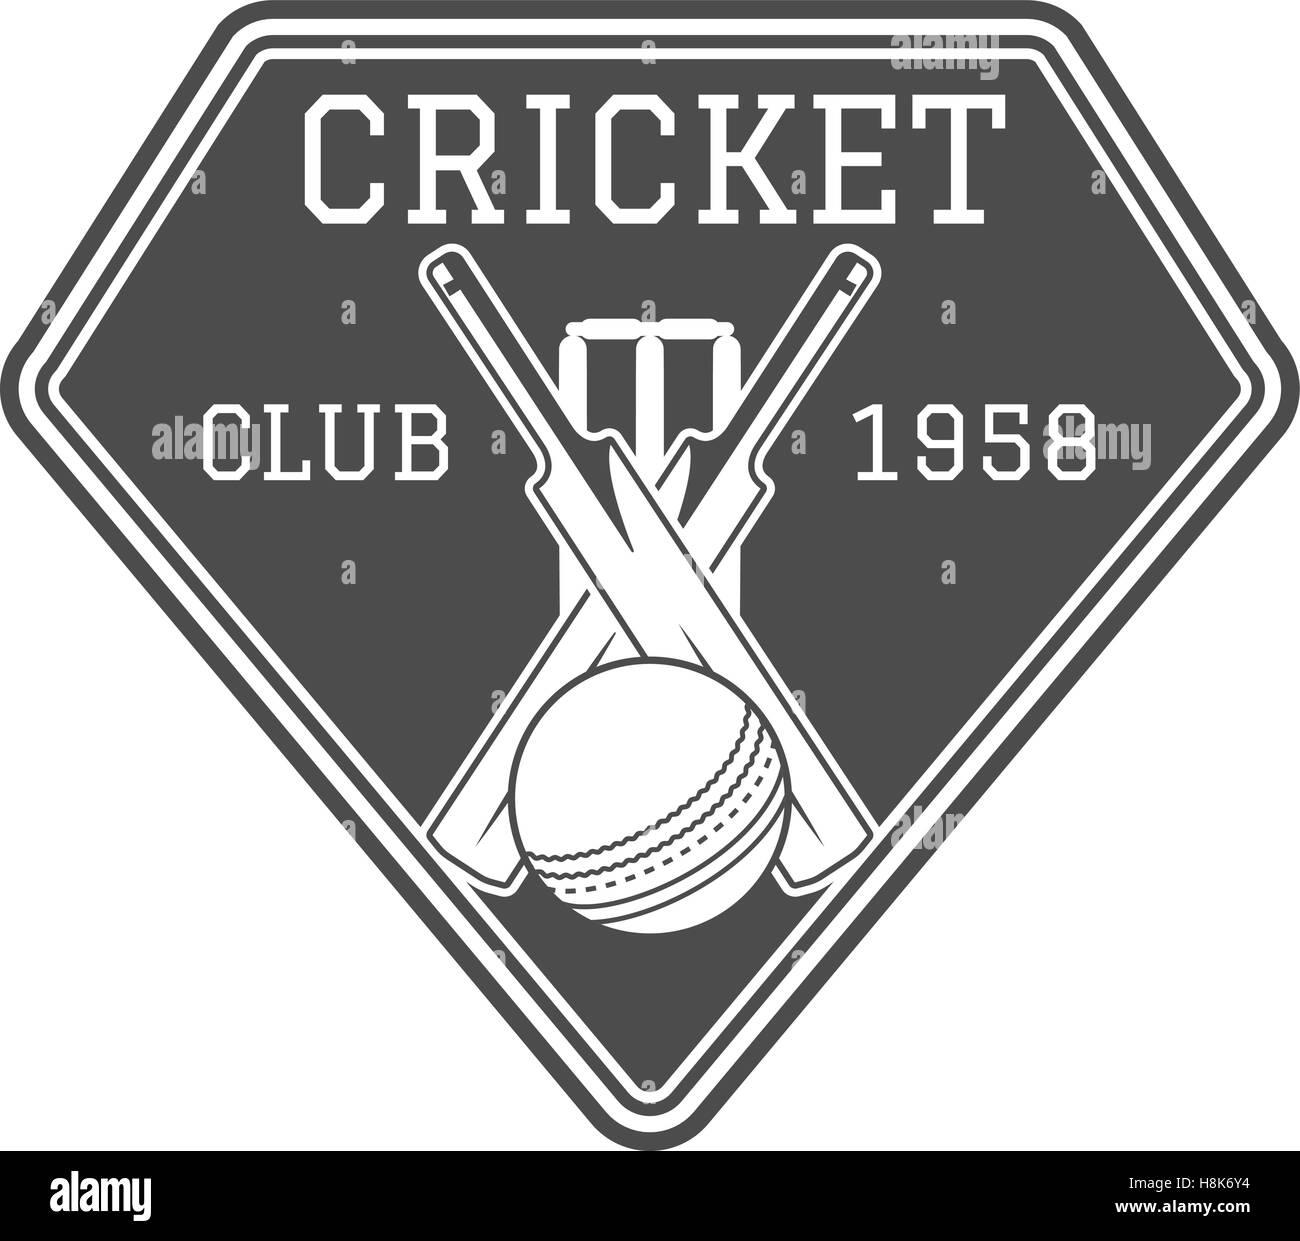 Cricket Club Emblem And Design Elements Cricket Team Logo Design Stock Vector Image Art Alamy,Responsive Web Design Breakpoints